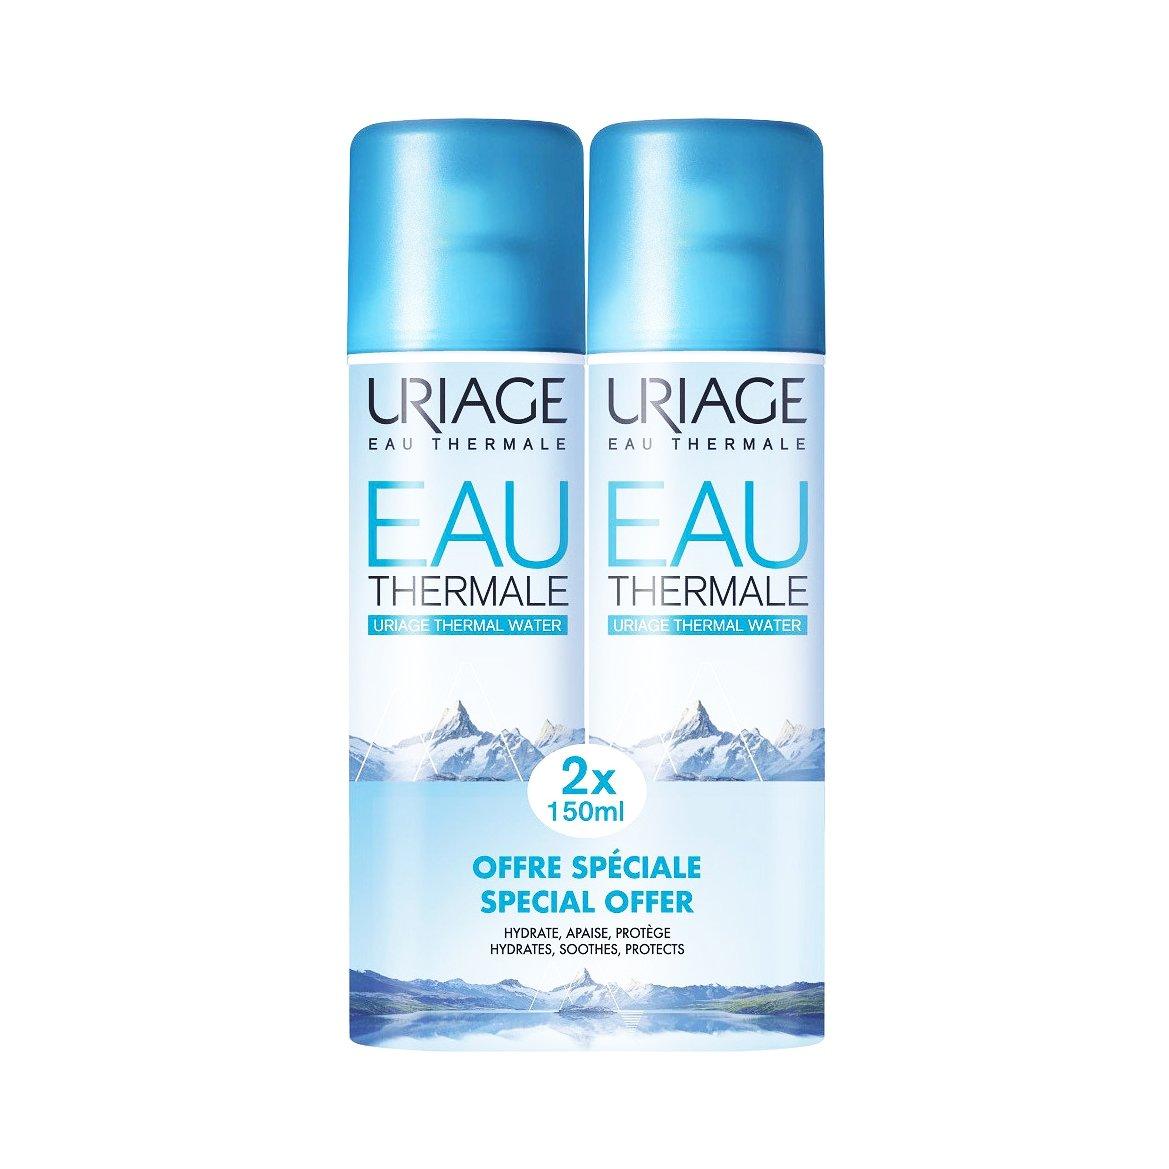 Uriage Promo Eau Thermal Water Σπρέι Ιαματικού Νερού 2x150ml